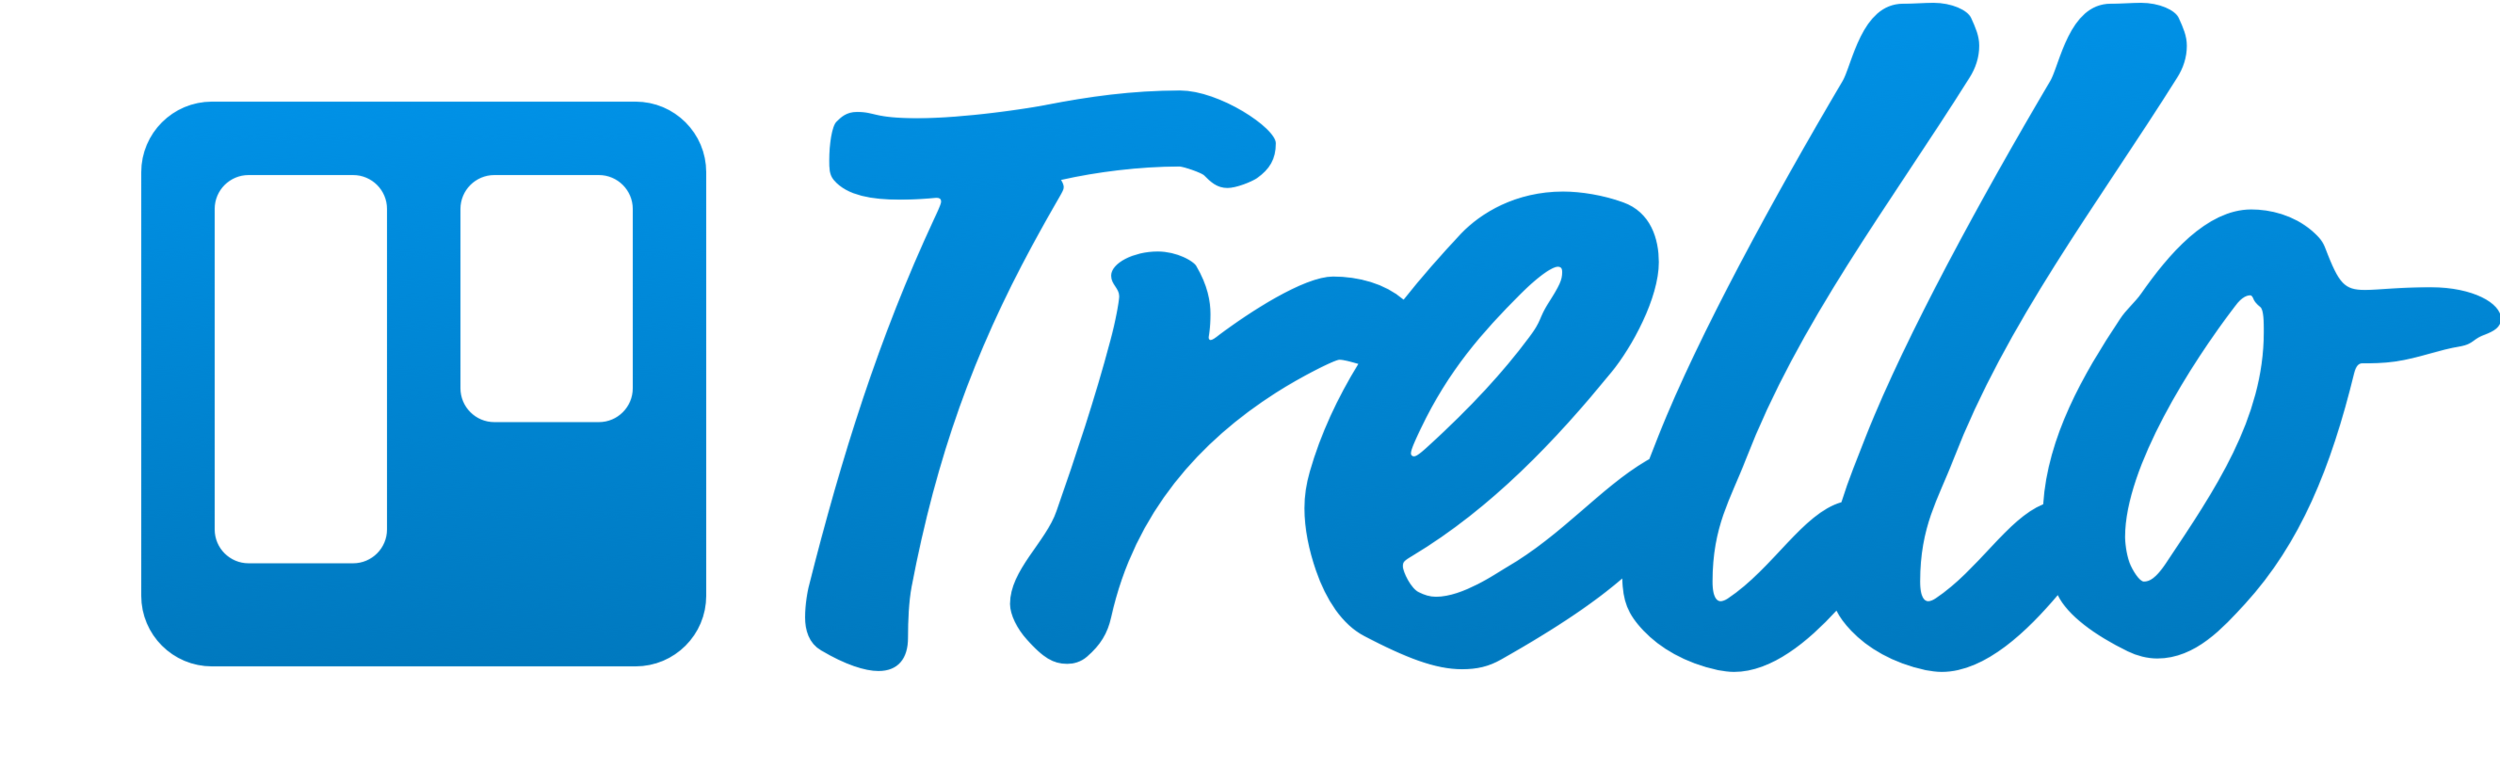 Here's how I use Trello for my business at hazelhaven.com